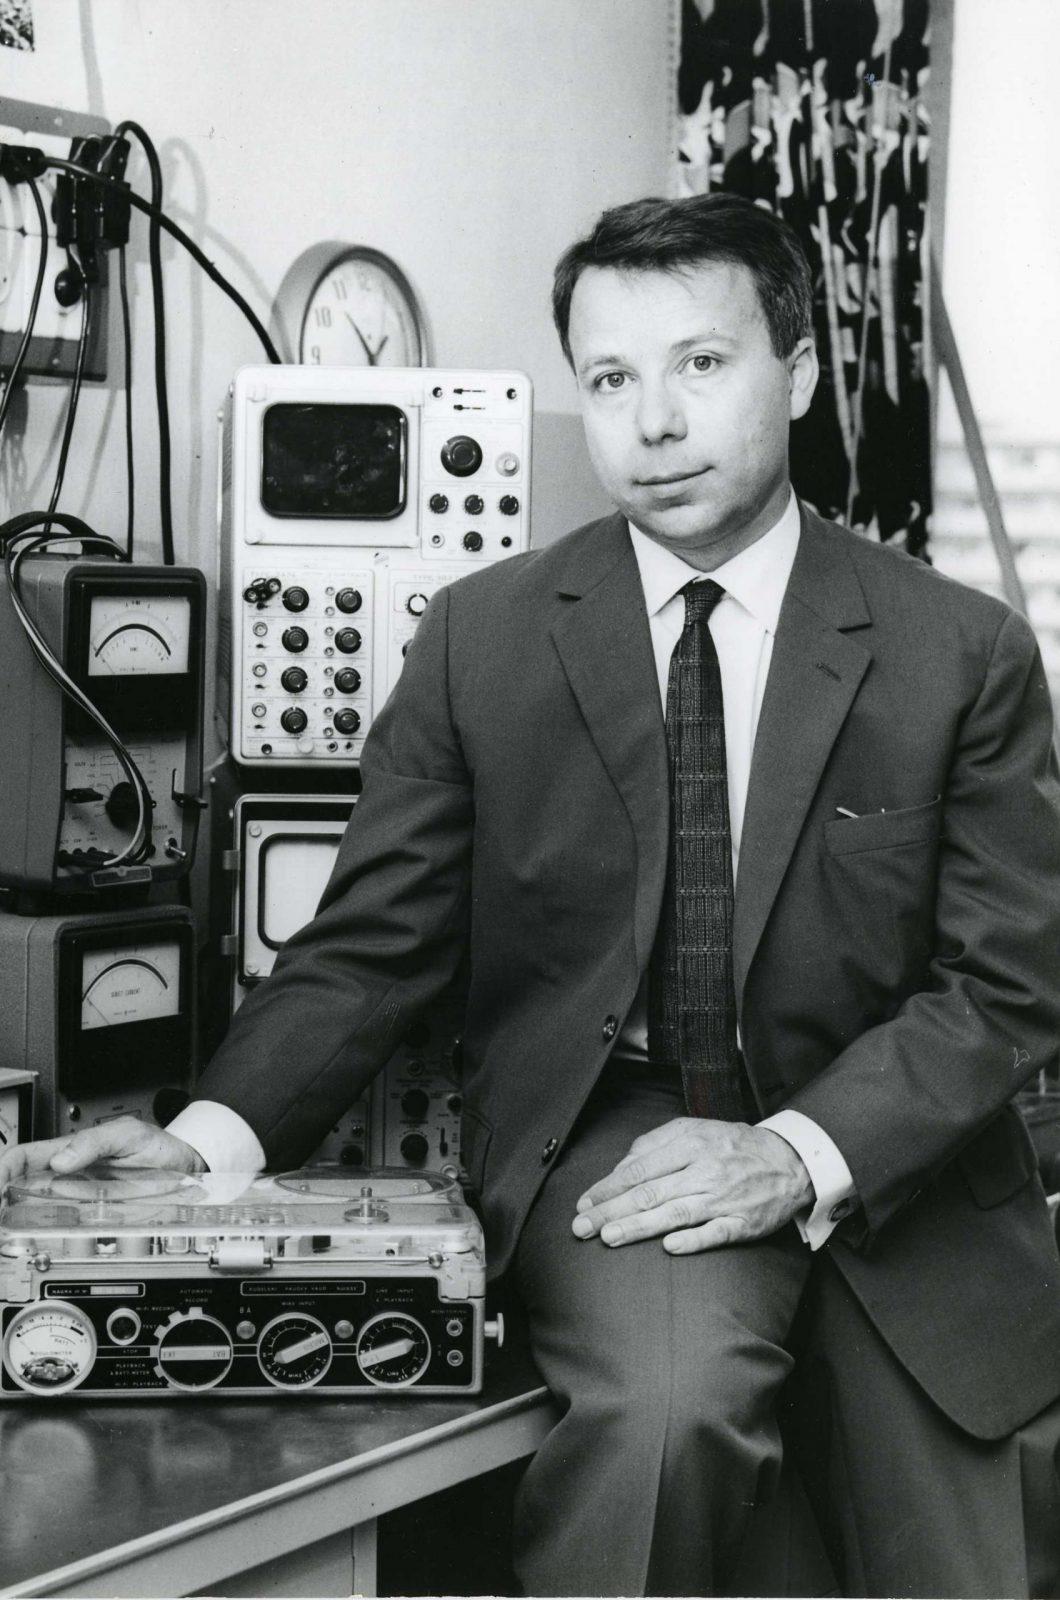 En 1957, six ans après la création du Nagra, Stefan Kudelski lance le Nagra III.